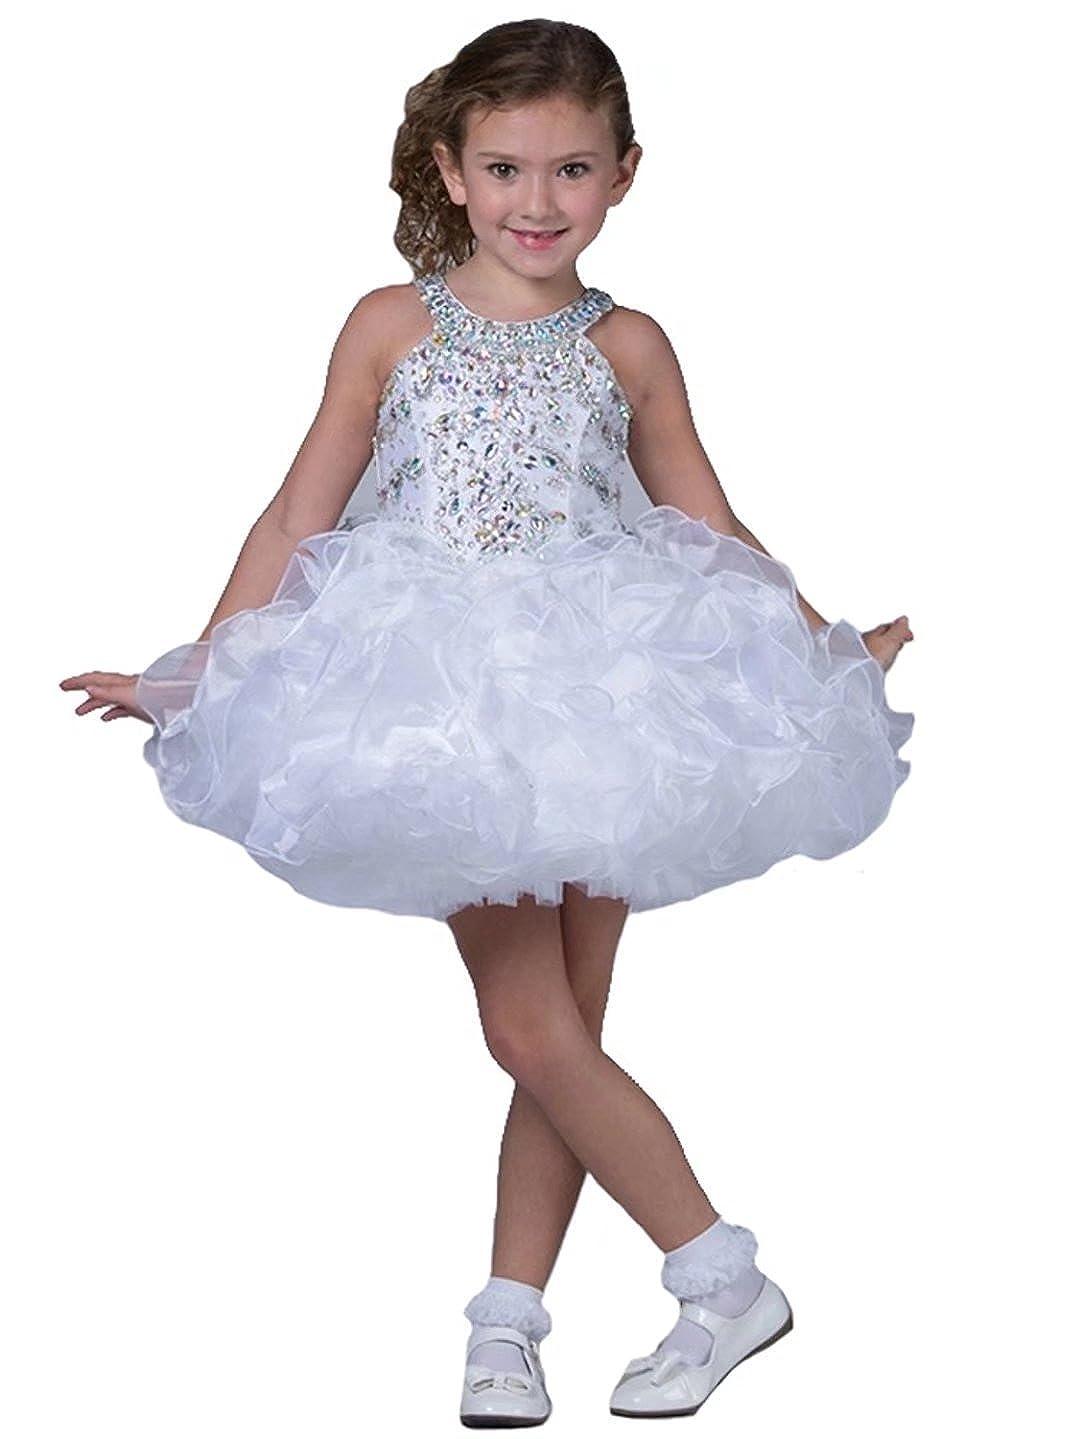 Lilibridal DRESS ガールズ ガールズ 1 DRESS ホワイト 1 B0762JLNSJ, 国産品:d2a322d7 --- sharoshka.org